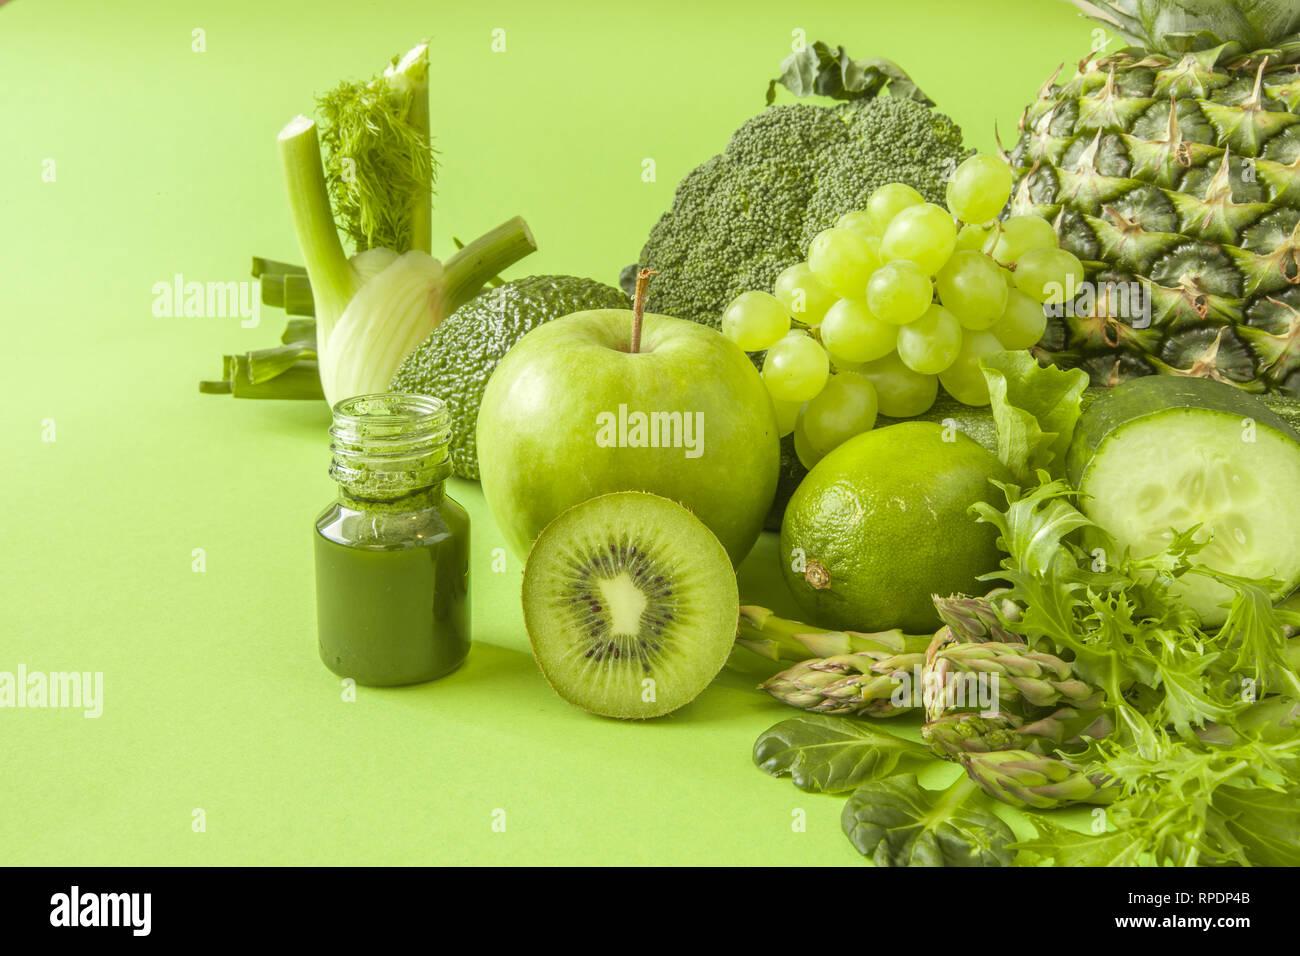 Green health smoothie fruits and vegetables, kale leaves, lime, apple, kiwi, grapes, banana, avocado, lettuce pineapple salat. Copy space. Raw, vegan Stock Photo